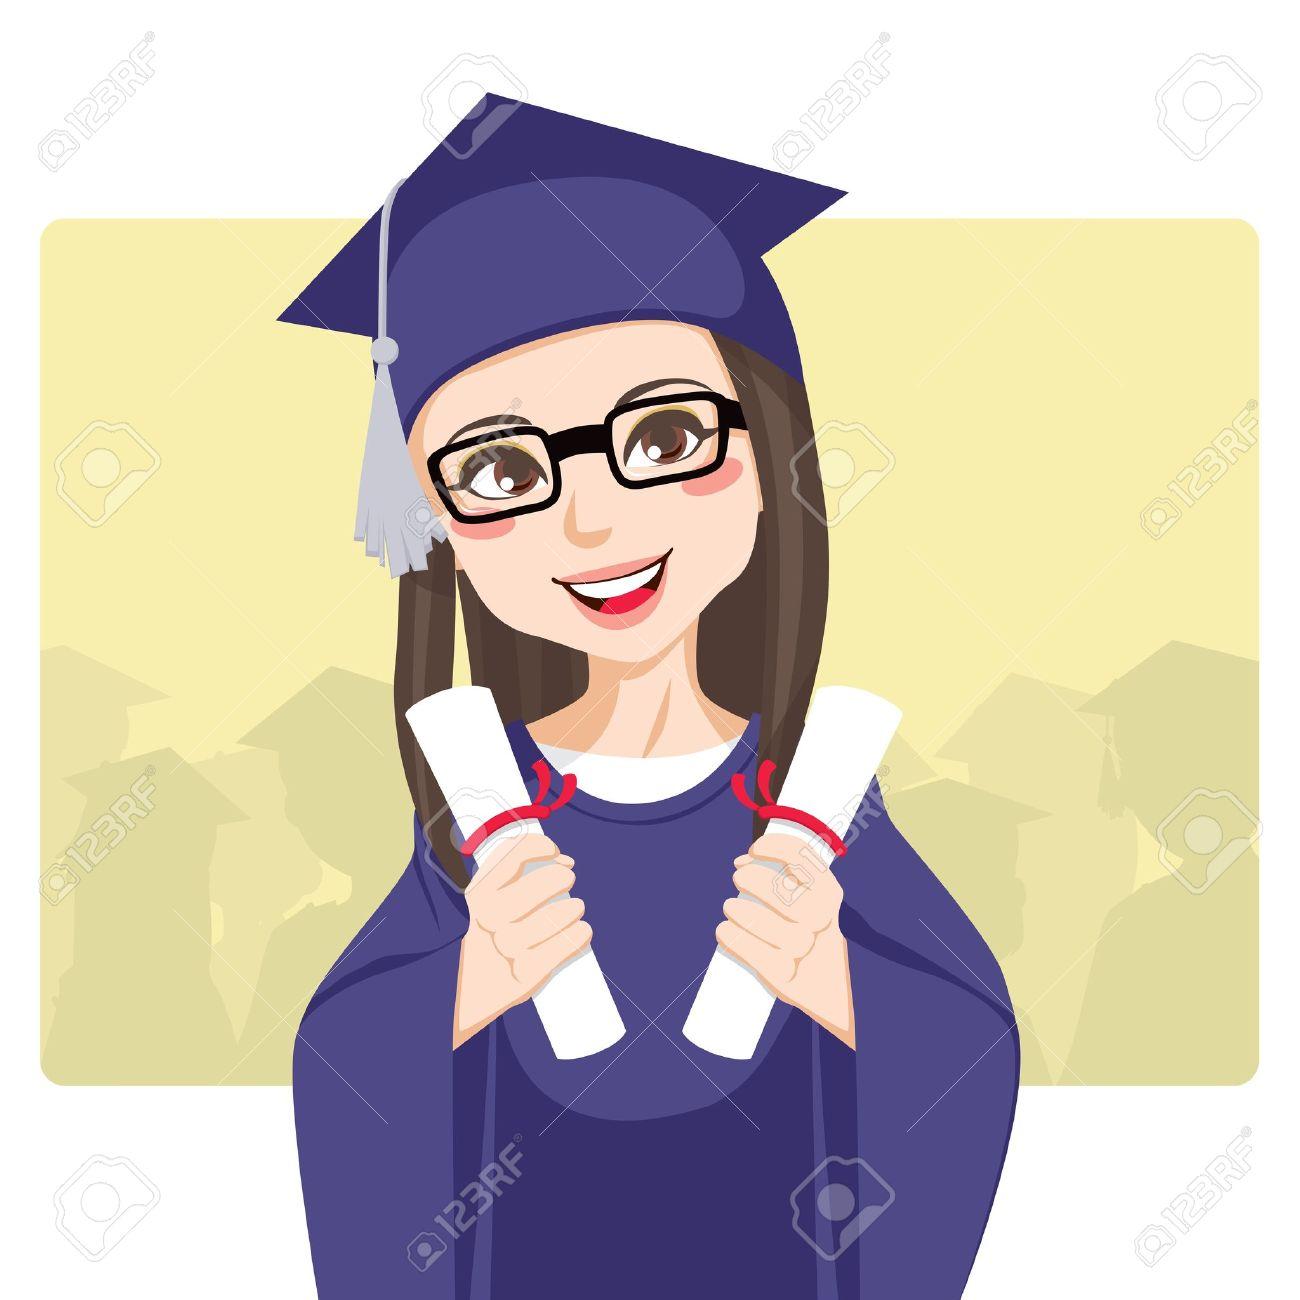 Joyful brunette with eyeglasses celebrating graduation day holding two diplomas on her hands smiling Stock Vector - 9572860